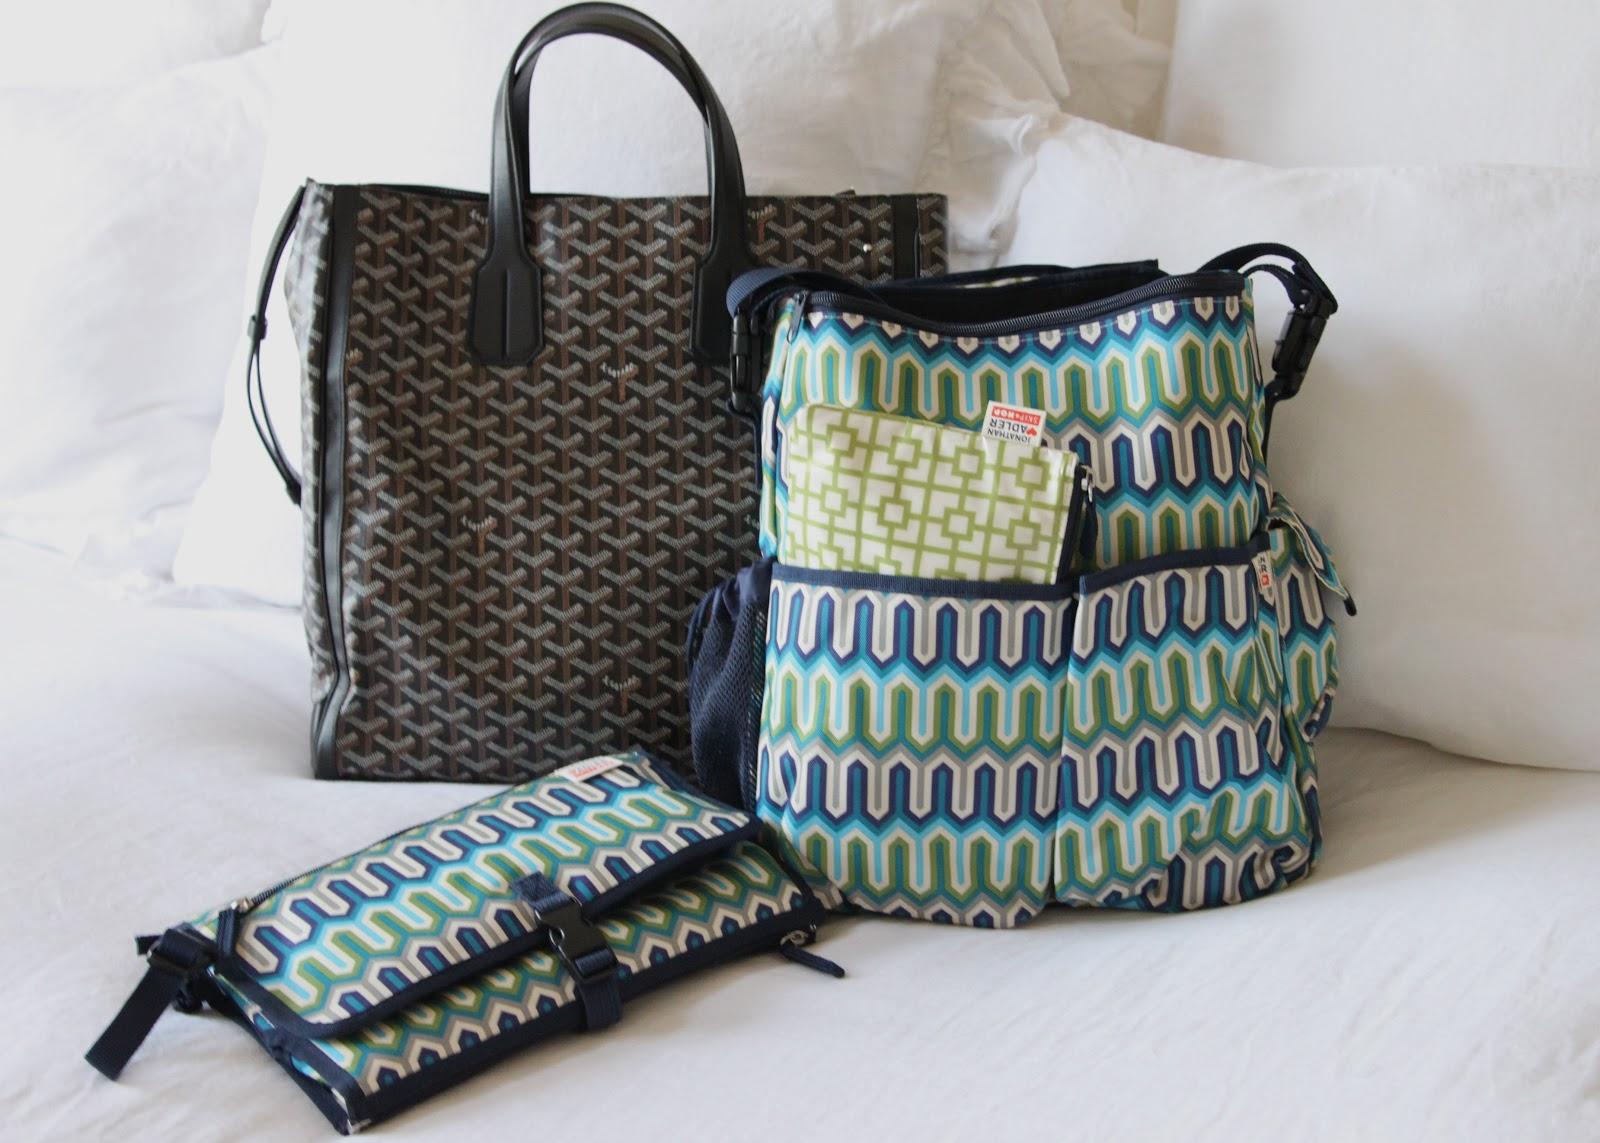 Diaper Bags Goyard From Barneys New York S Beverly Hills Location Jonathan Adler For Skip Hop Dash Bag In Chevron Blue And